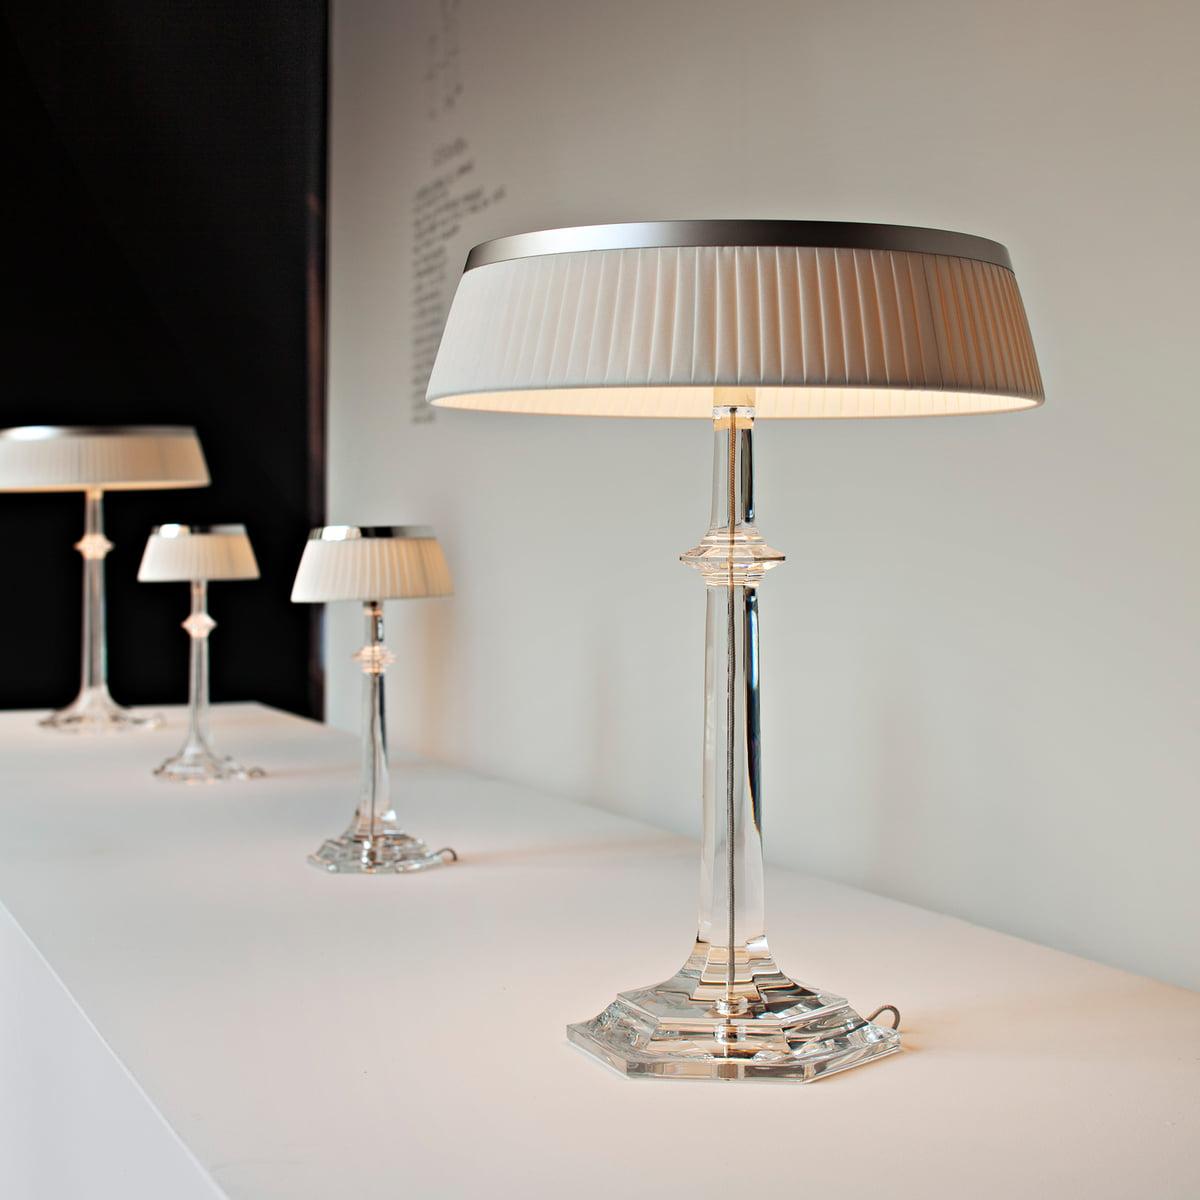 led table lighting. Bon Jour Versailles LED Table Lamp By Flos Led Lighting